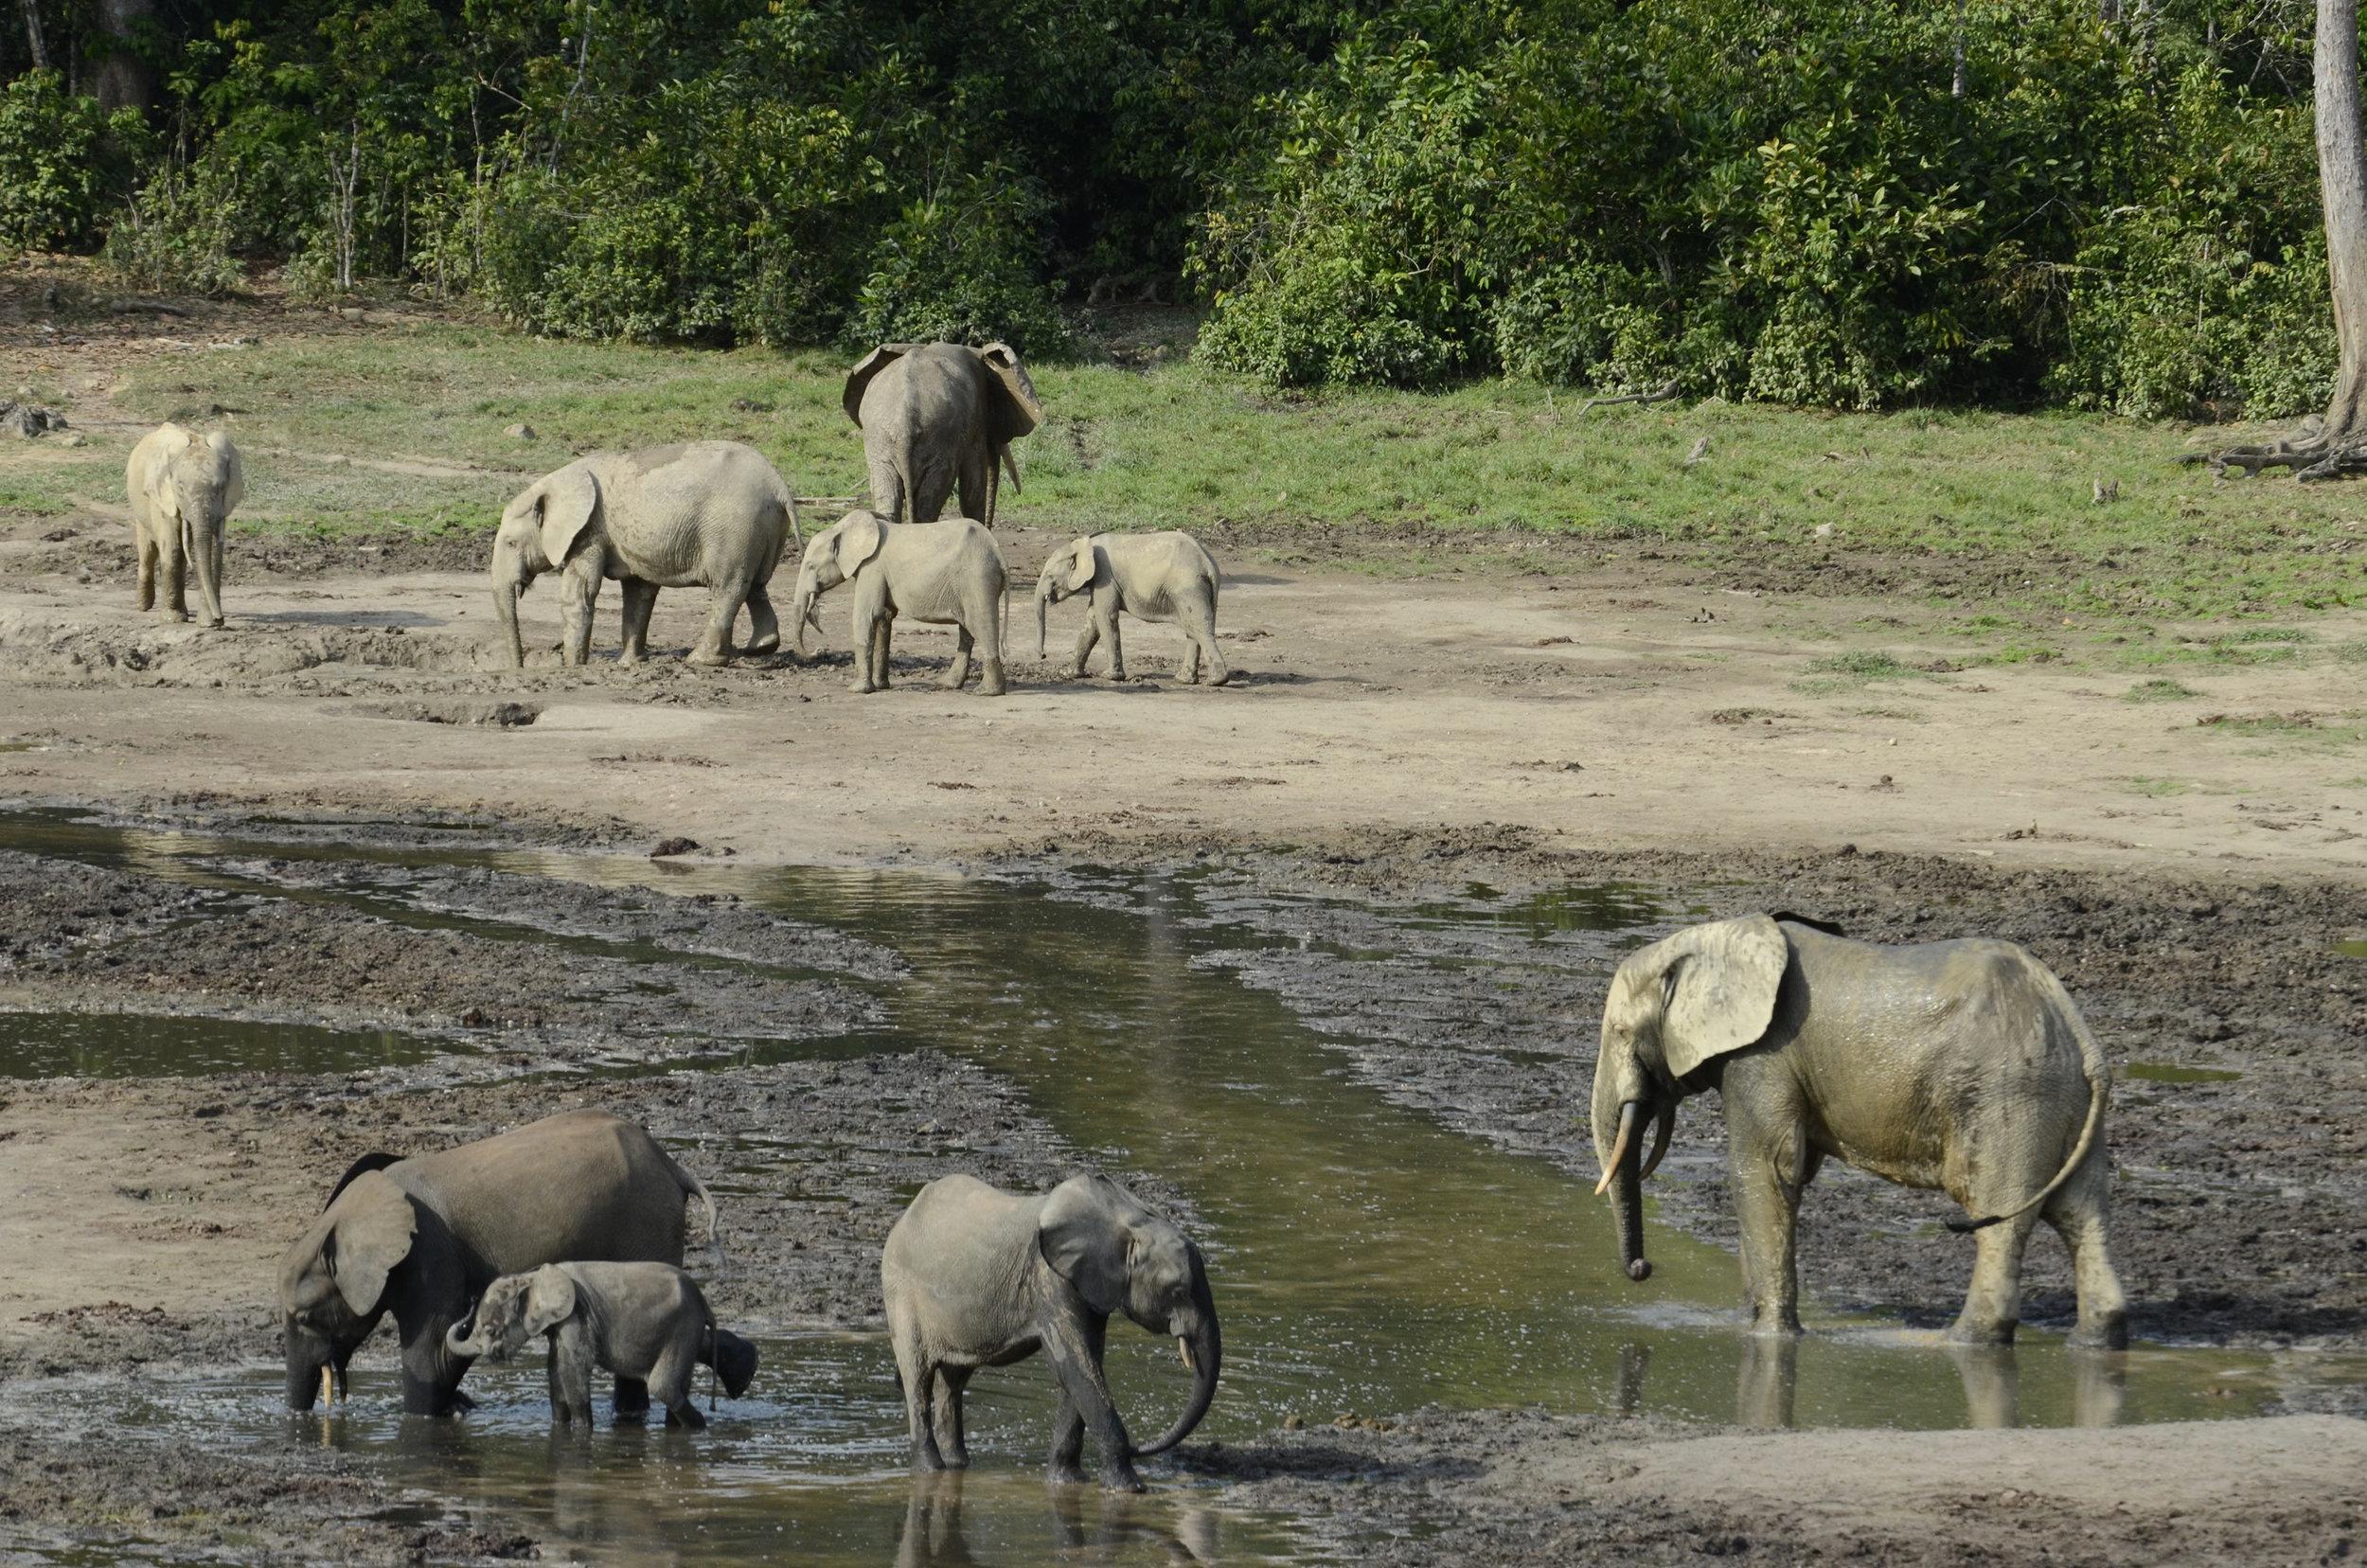 Cristián-Samper_5802_African-Forest-Elephants-Dzanga-Bai-Dzanga-Sangha_CAF_01-23-13.jpg